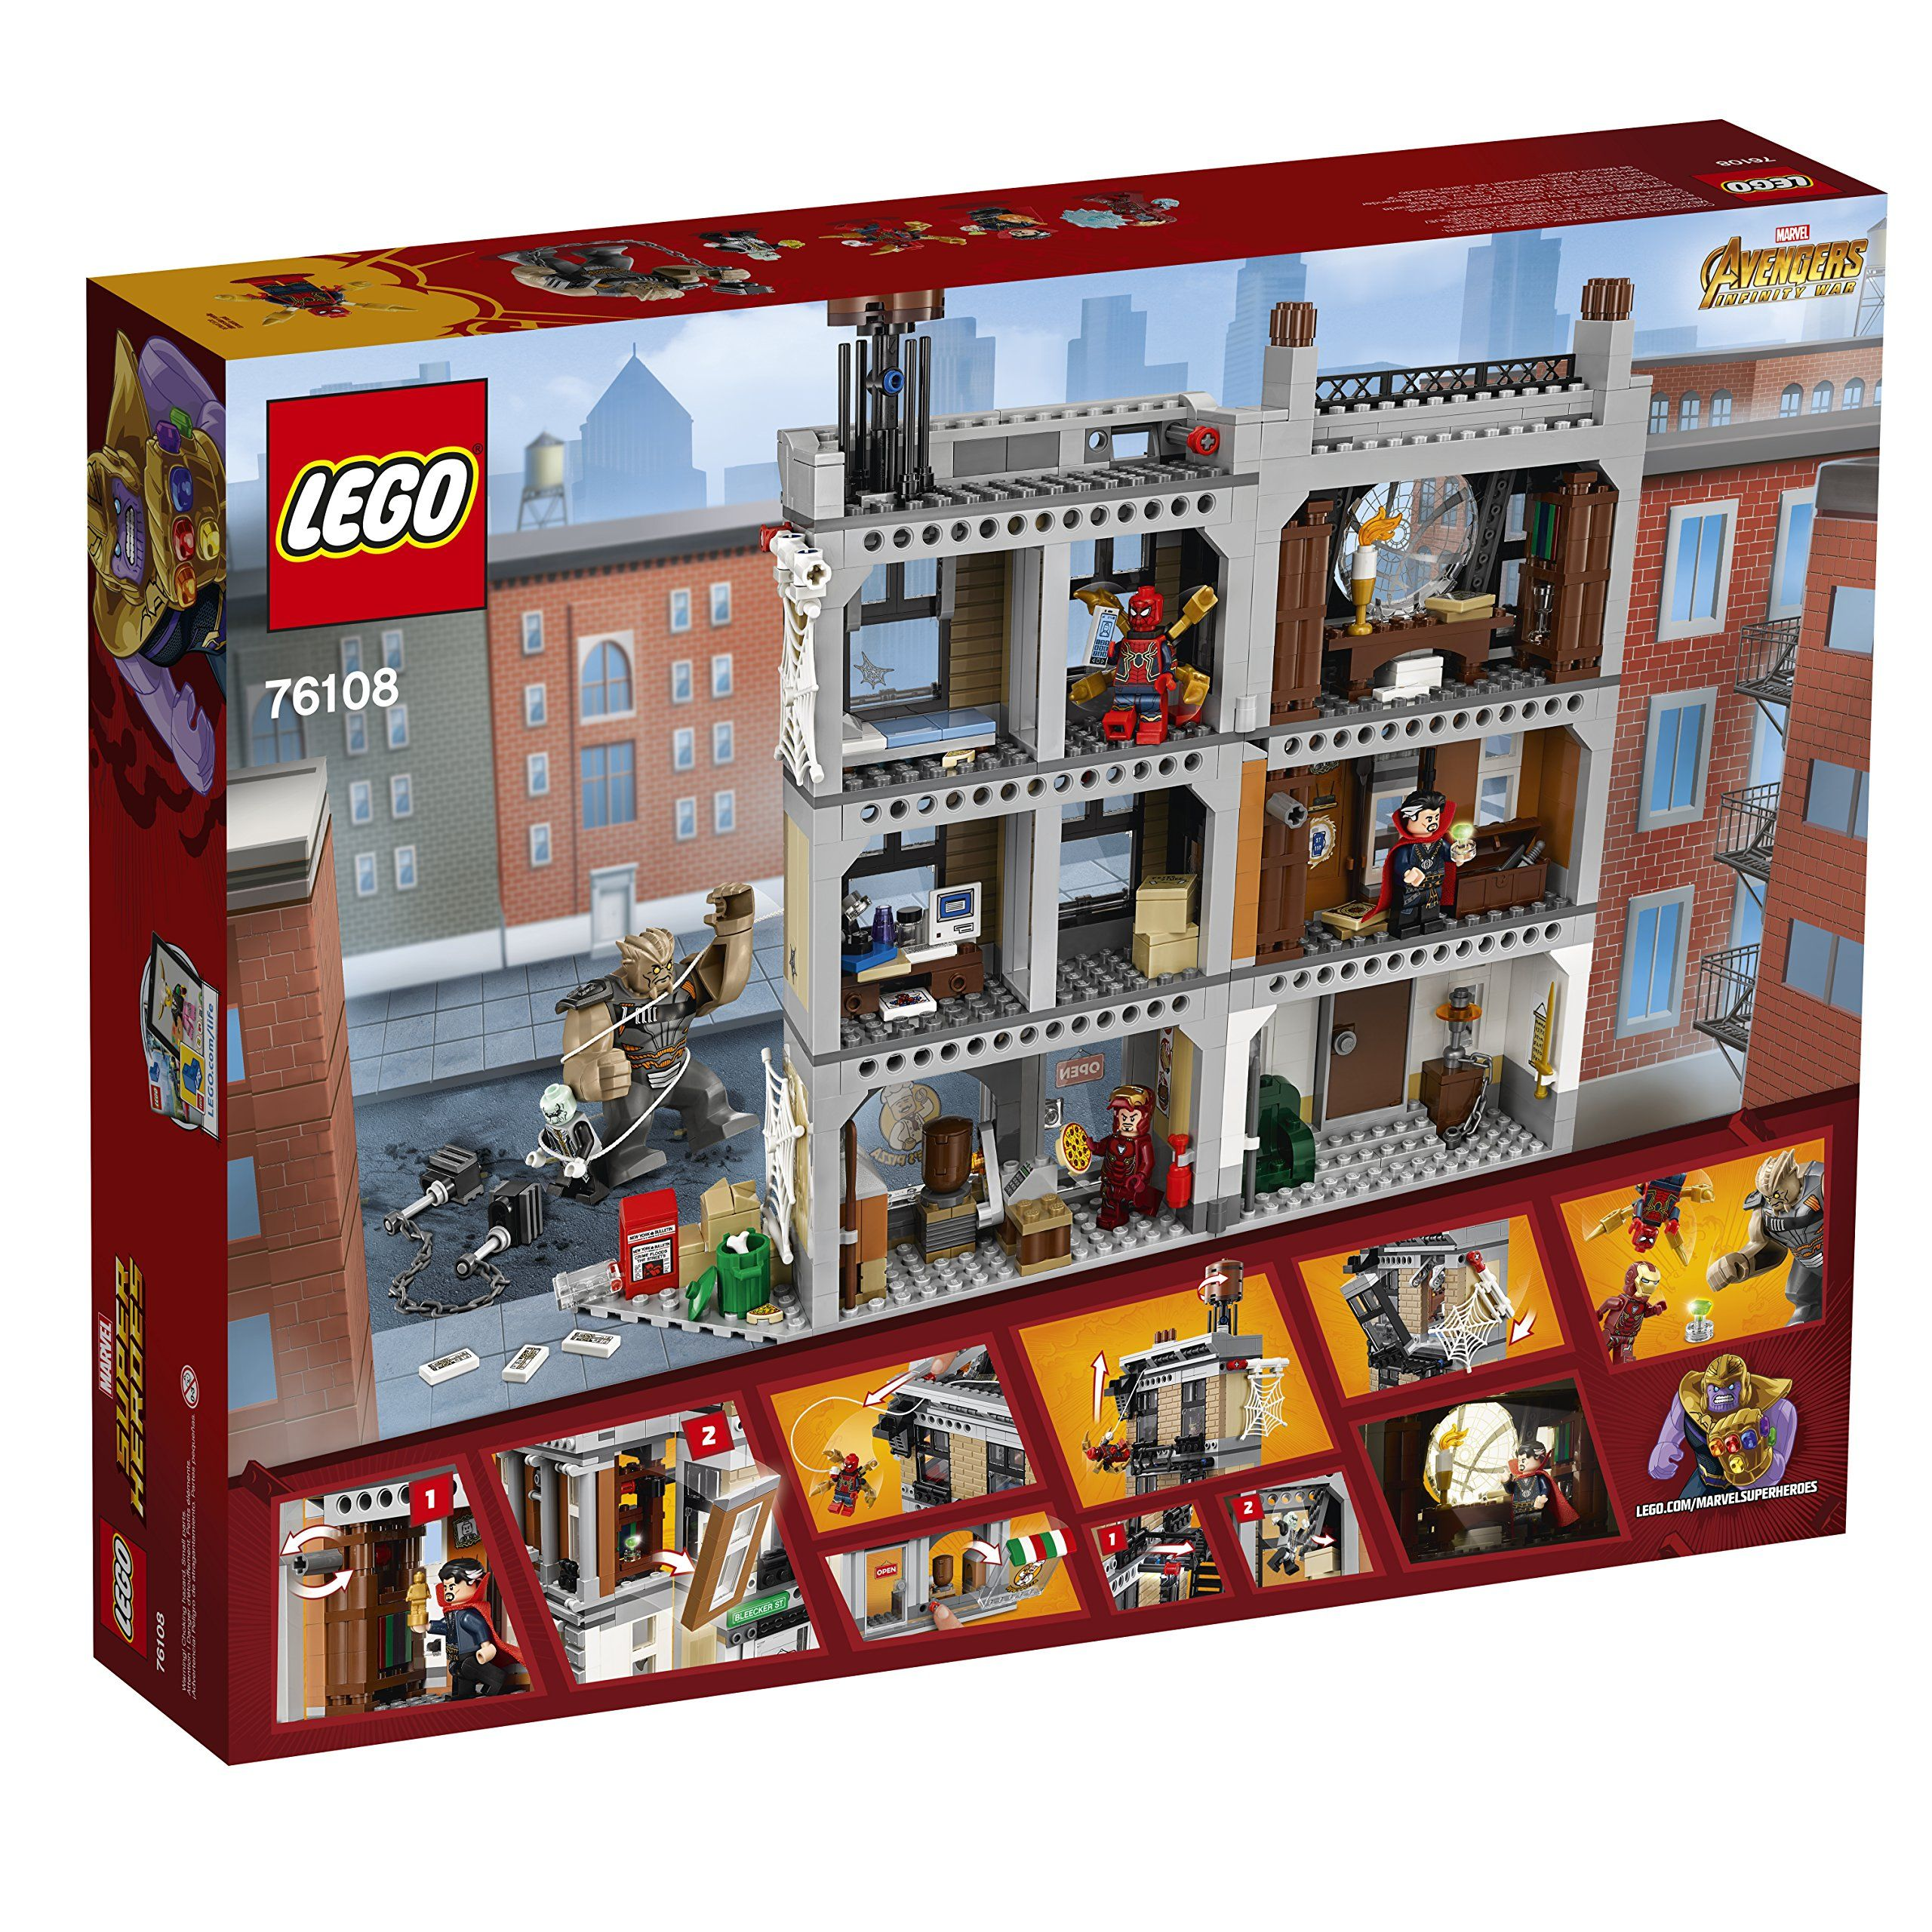 Lego Marvel Super Heroes Avengers Infinity War Sanctum Sanctorum Showdown 76108 Building Kit 1004 Lego Marvel Super Heroes Lego Marvel Marvel Avengers Movies